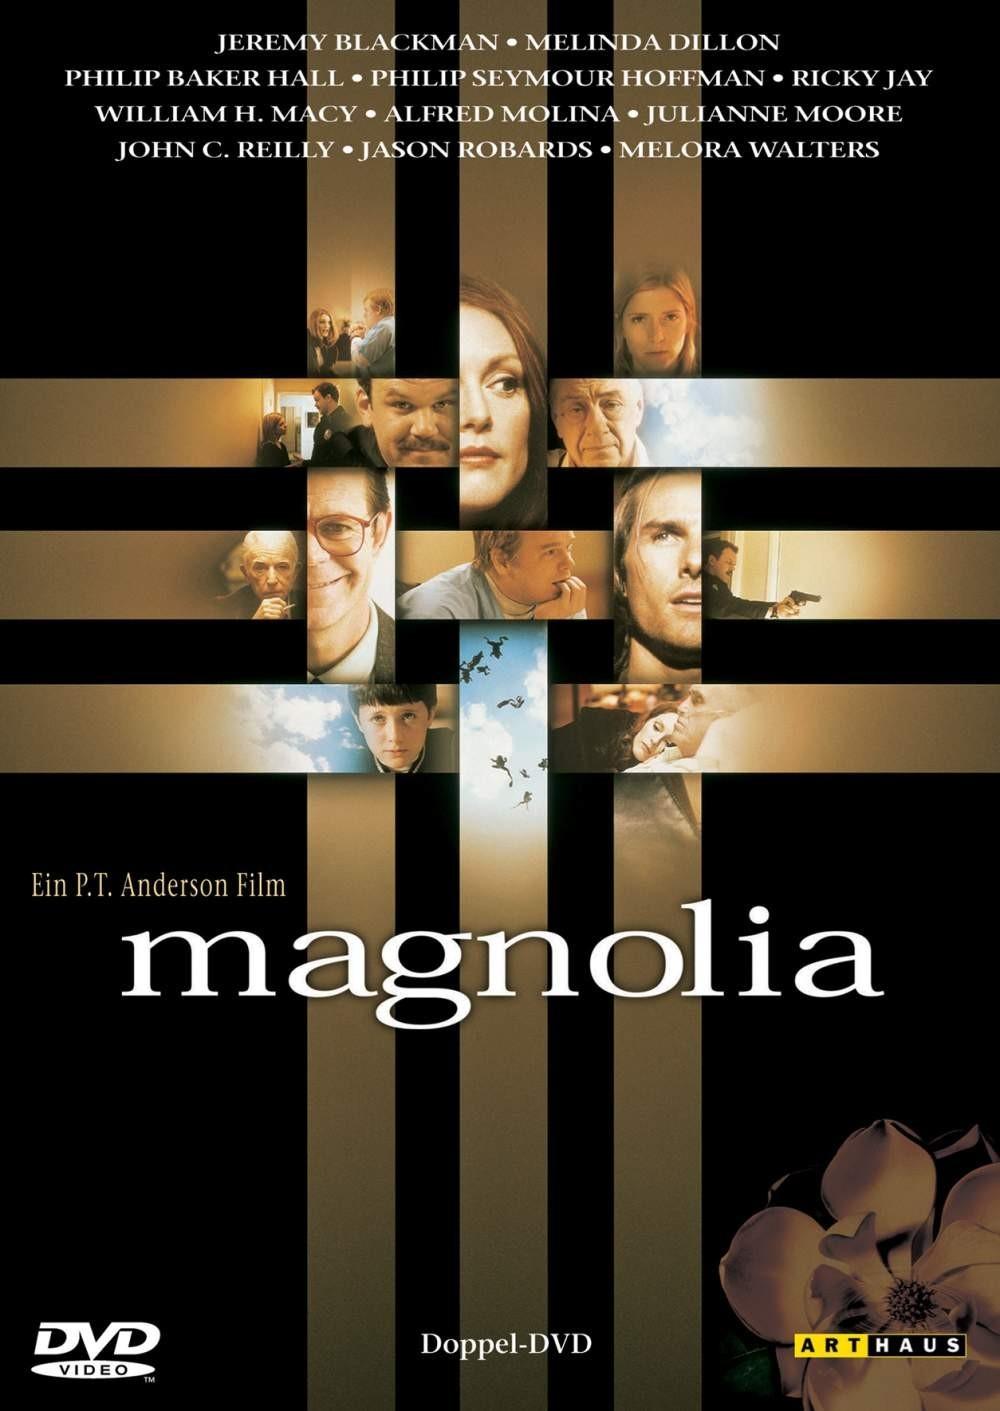 Magnolia (1999) - DVD PLANET STORE